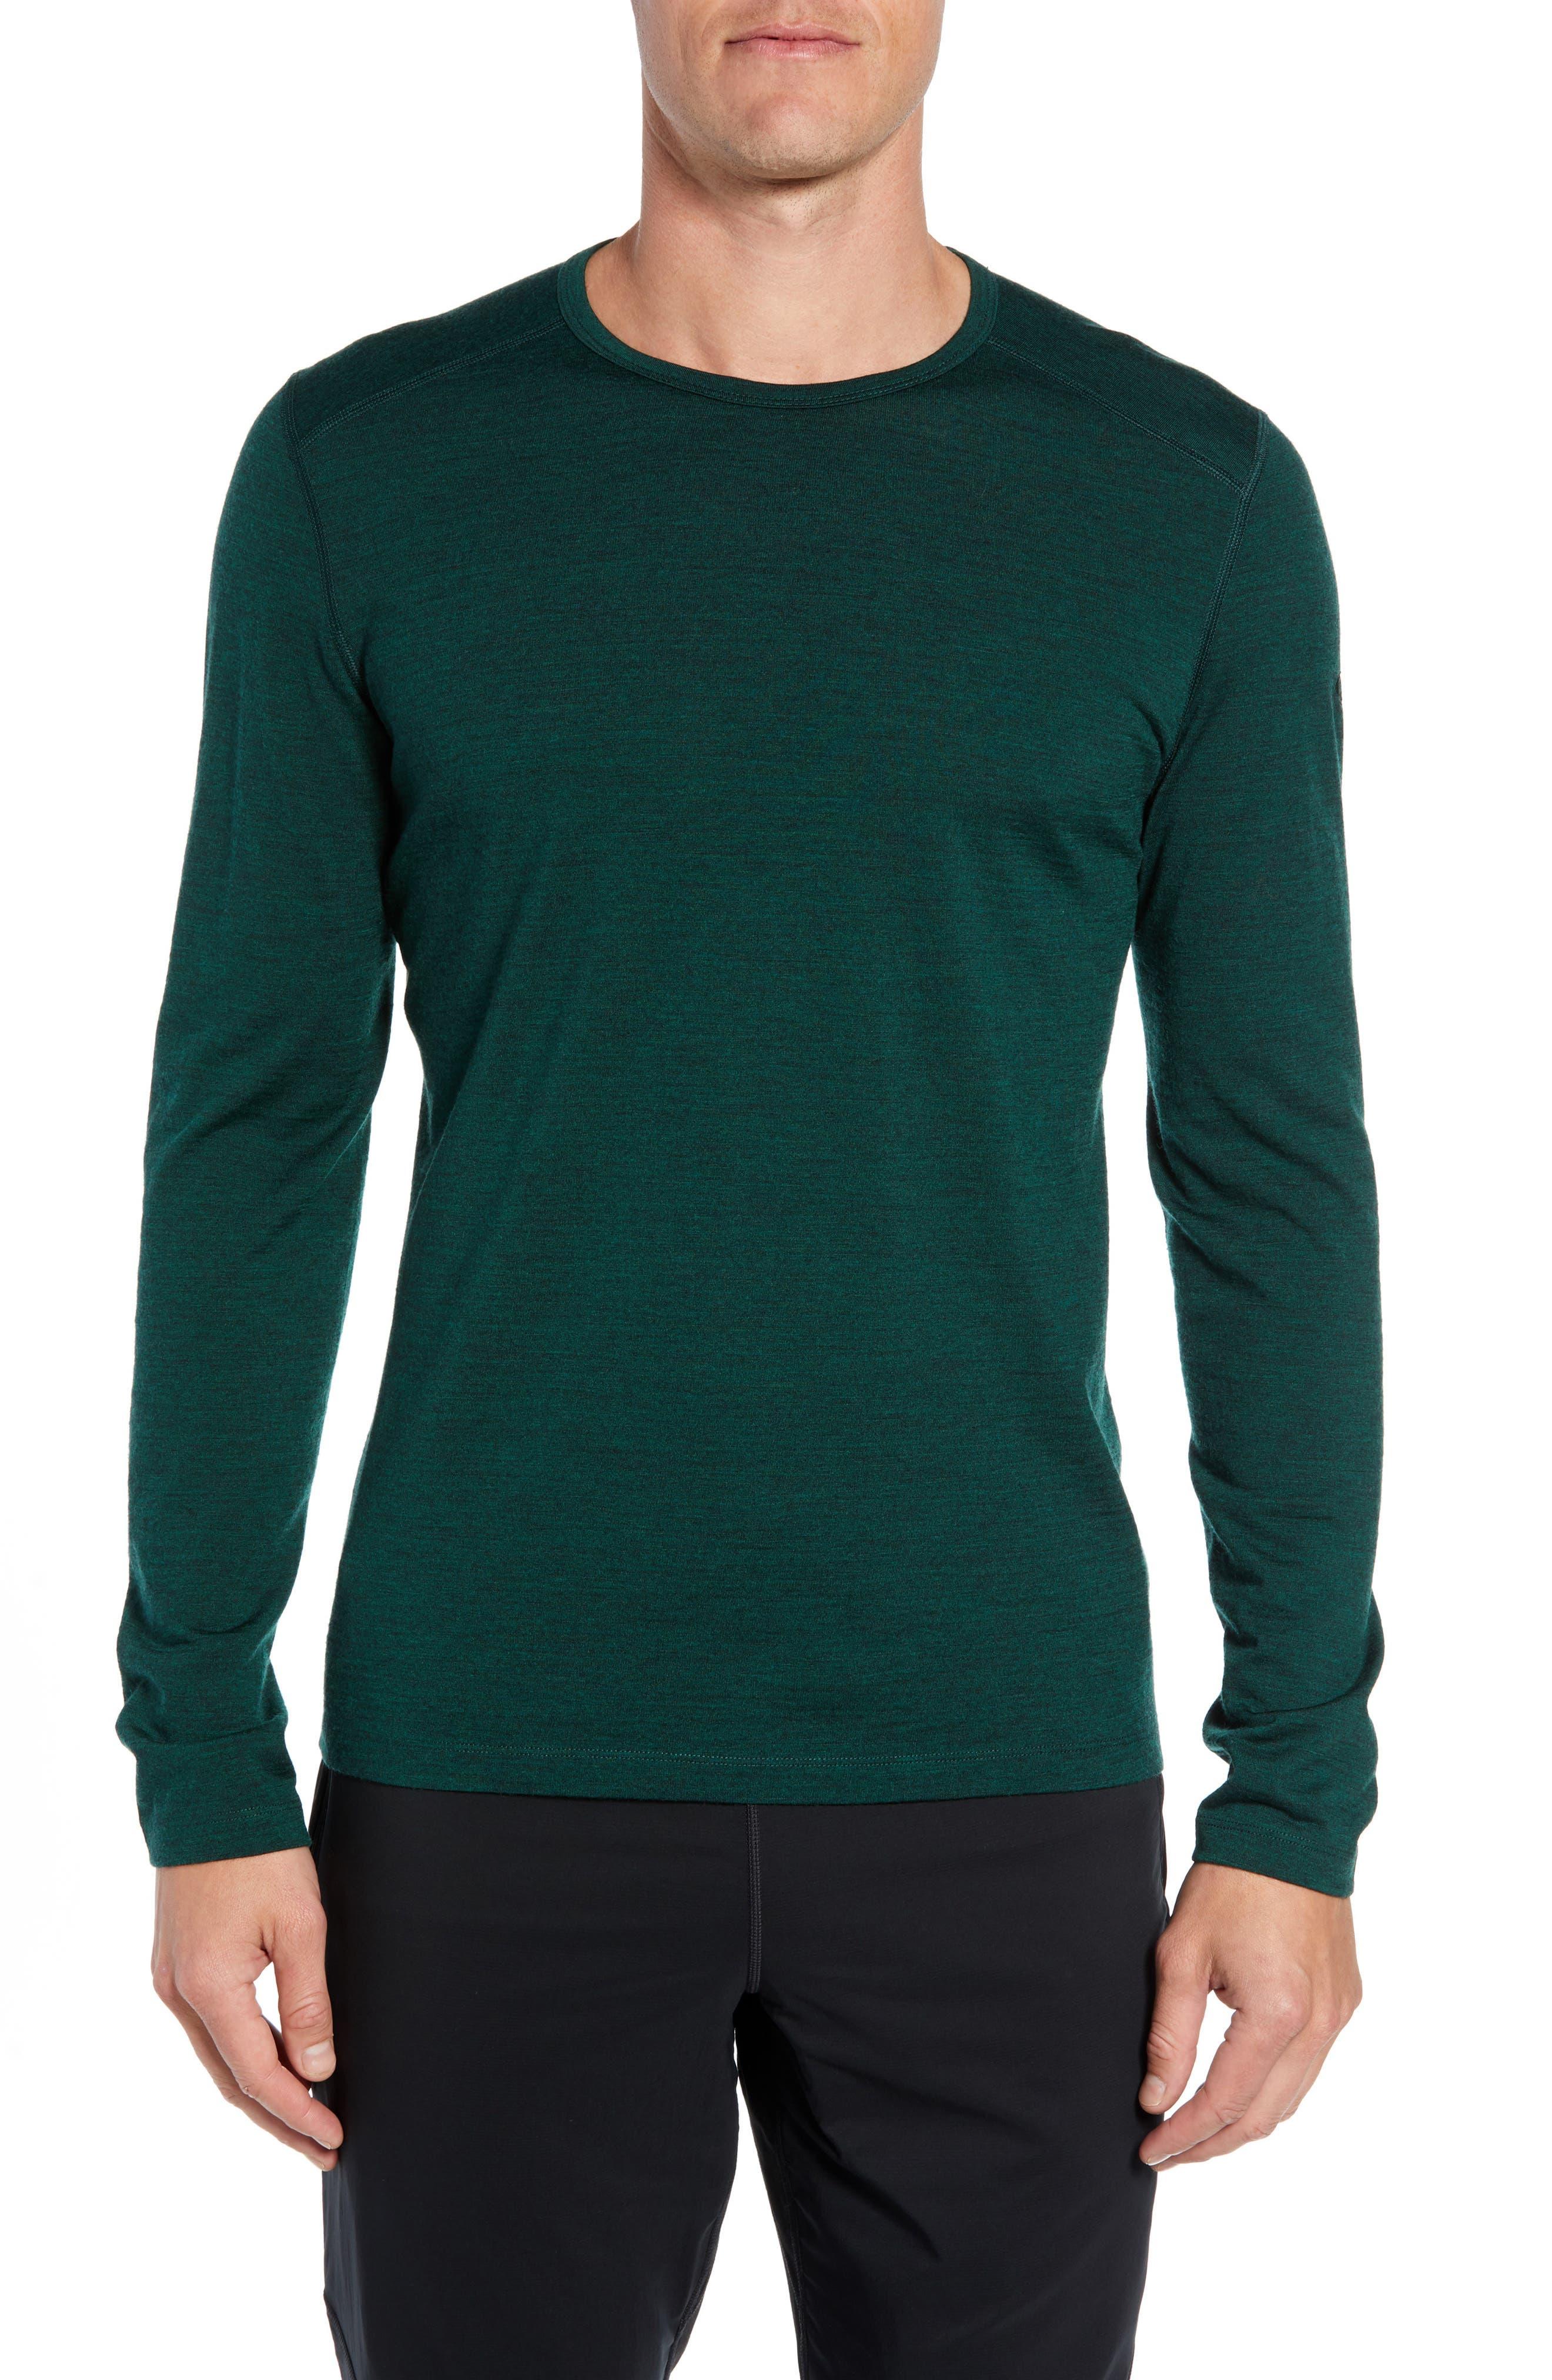 Icebreaker Oasis Slim Merino Wool T-Shirt, Green